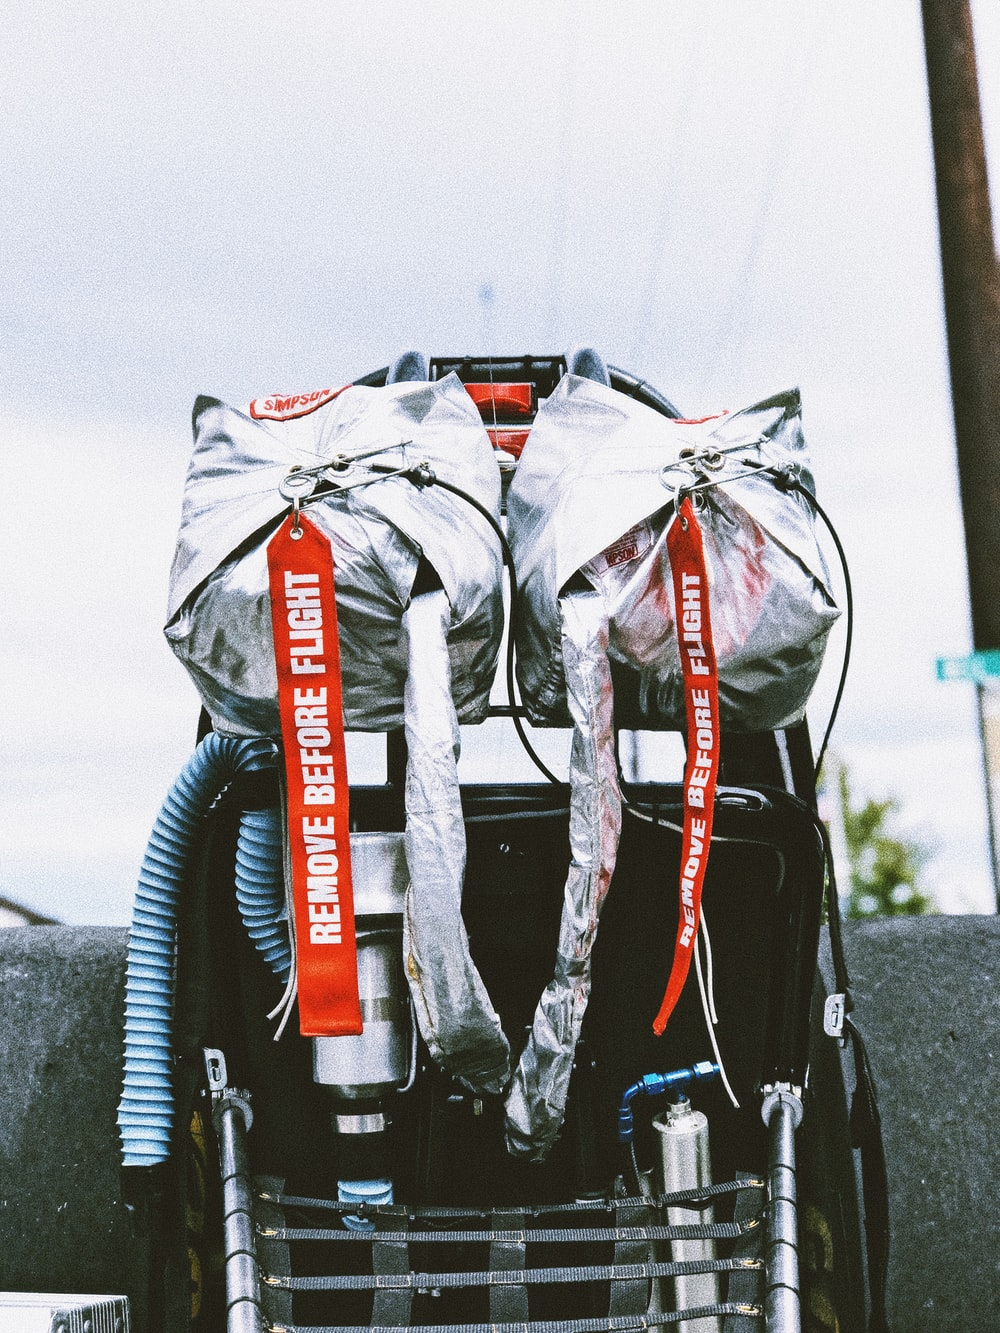 close-up photo of bag